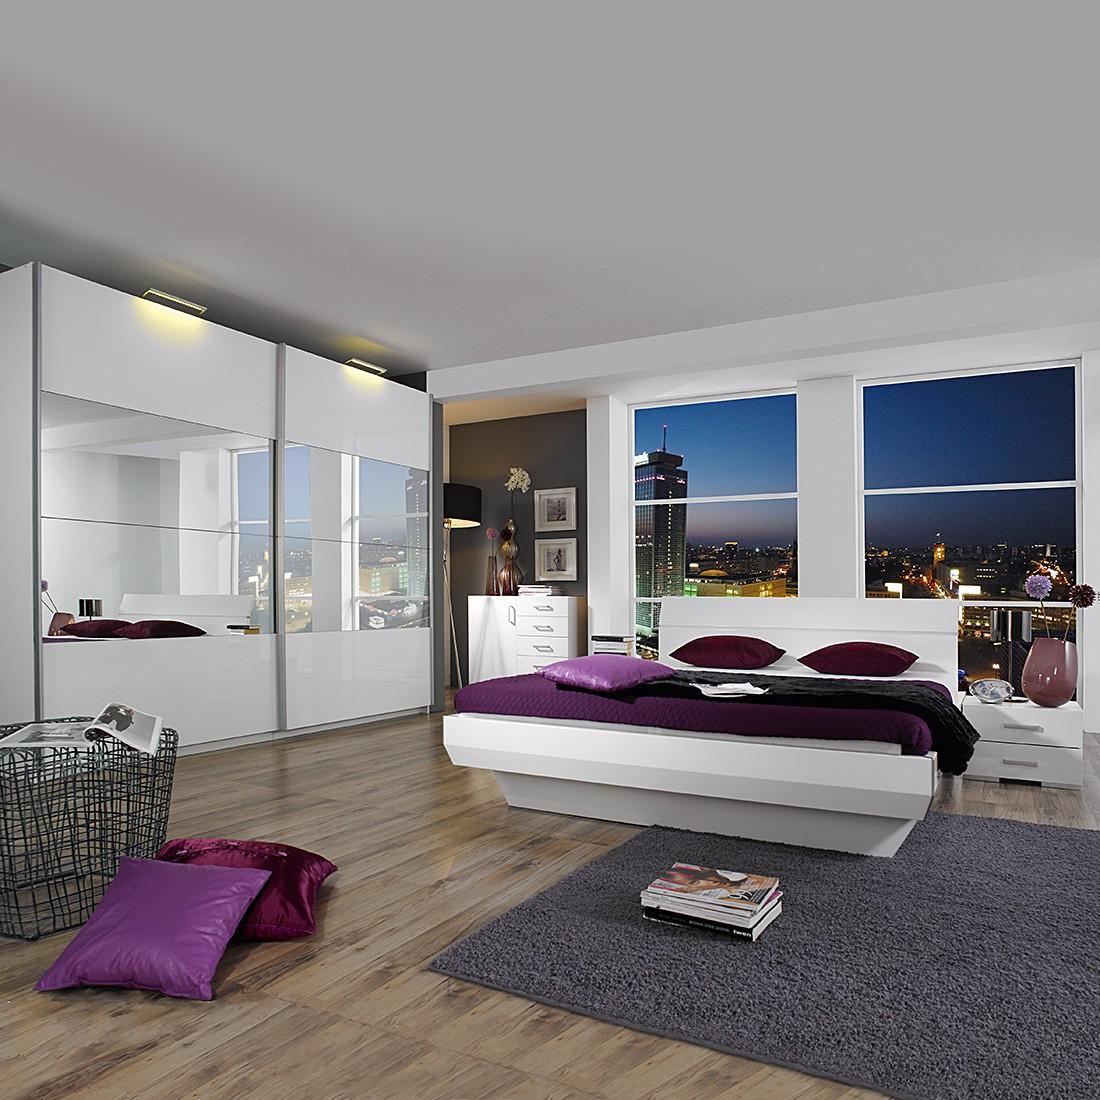 Komplettset Tira – Alpinweiß/Hochglanz Weiß/Spiegel – Liegefläche Bett: 140 x 200cm, Rauch Select online kaufen